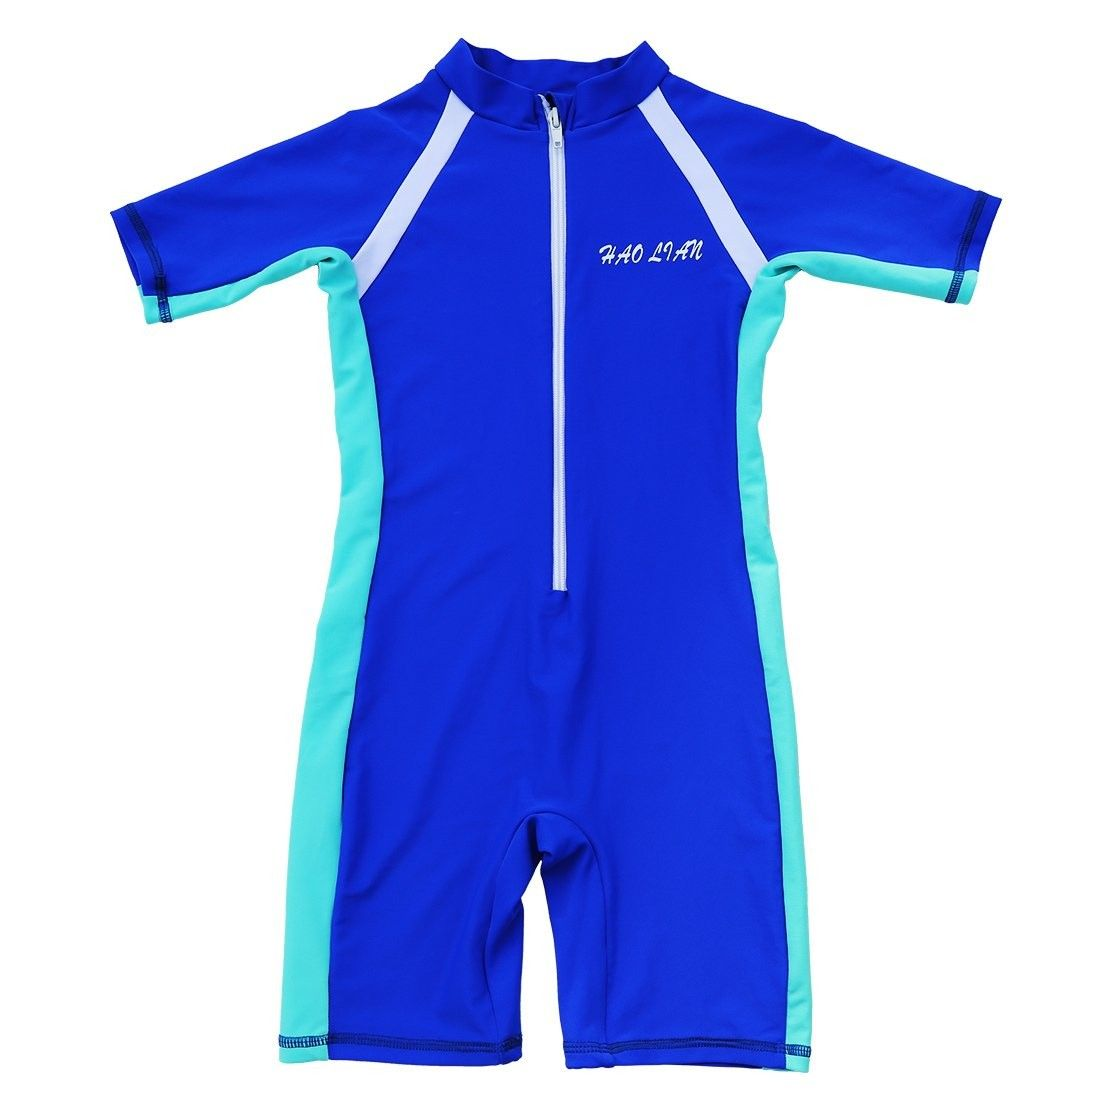 HaoLian Boys Kids Swimsuit One Piece Rashguard Short Sleeve Swimwear with UPF50+